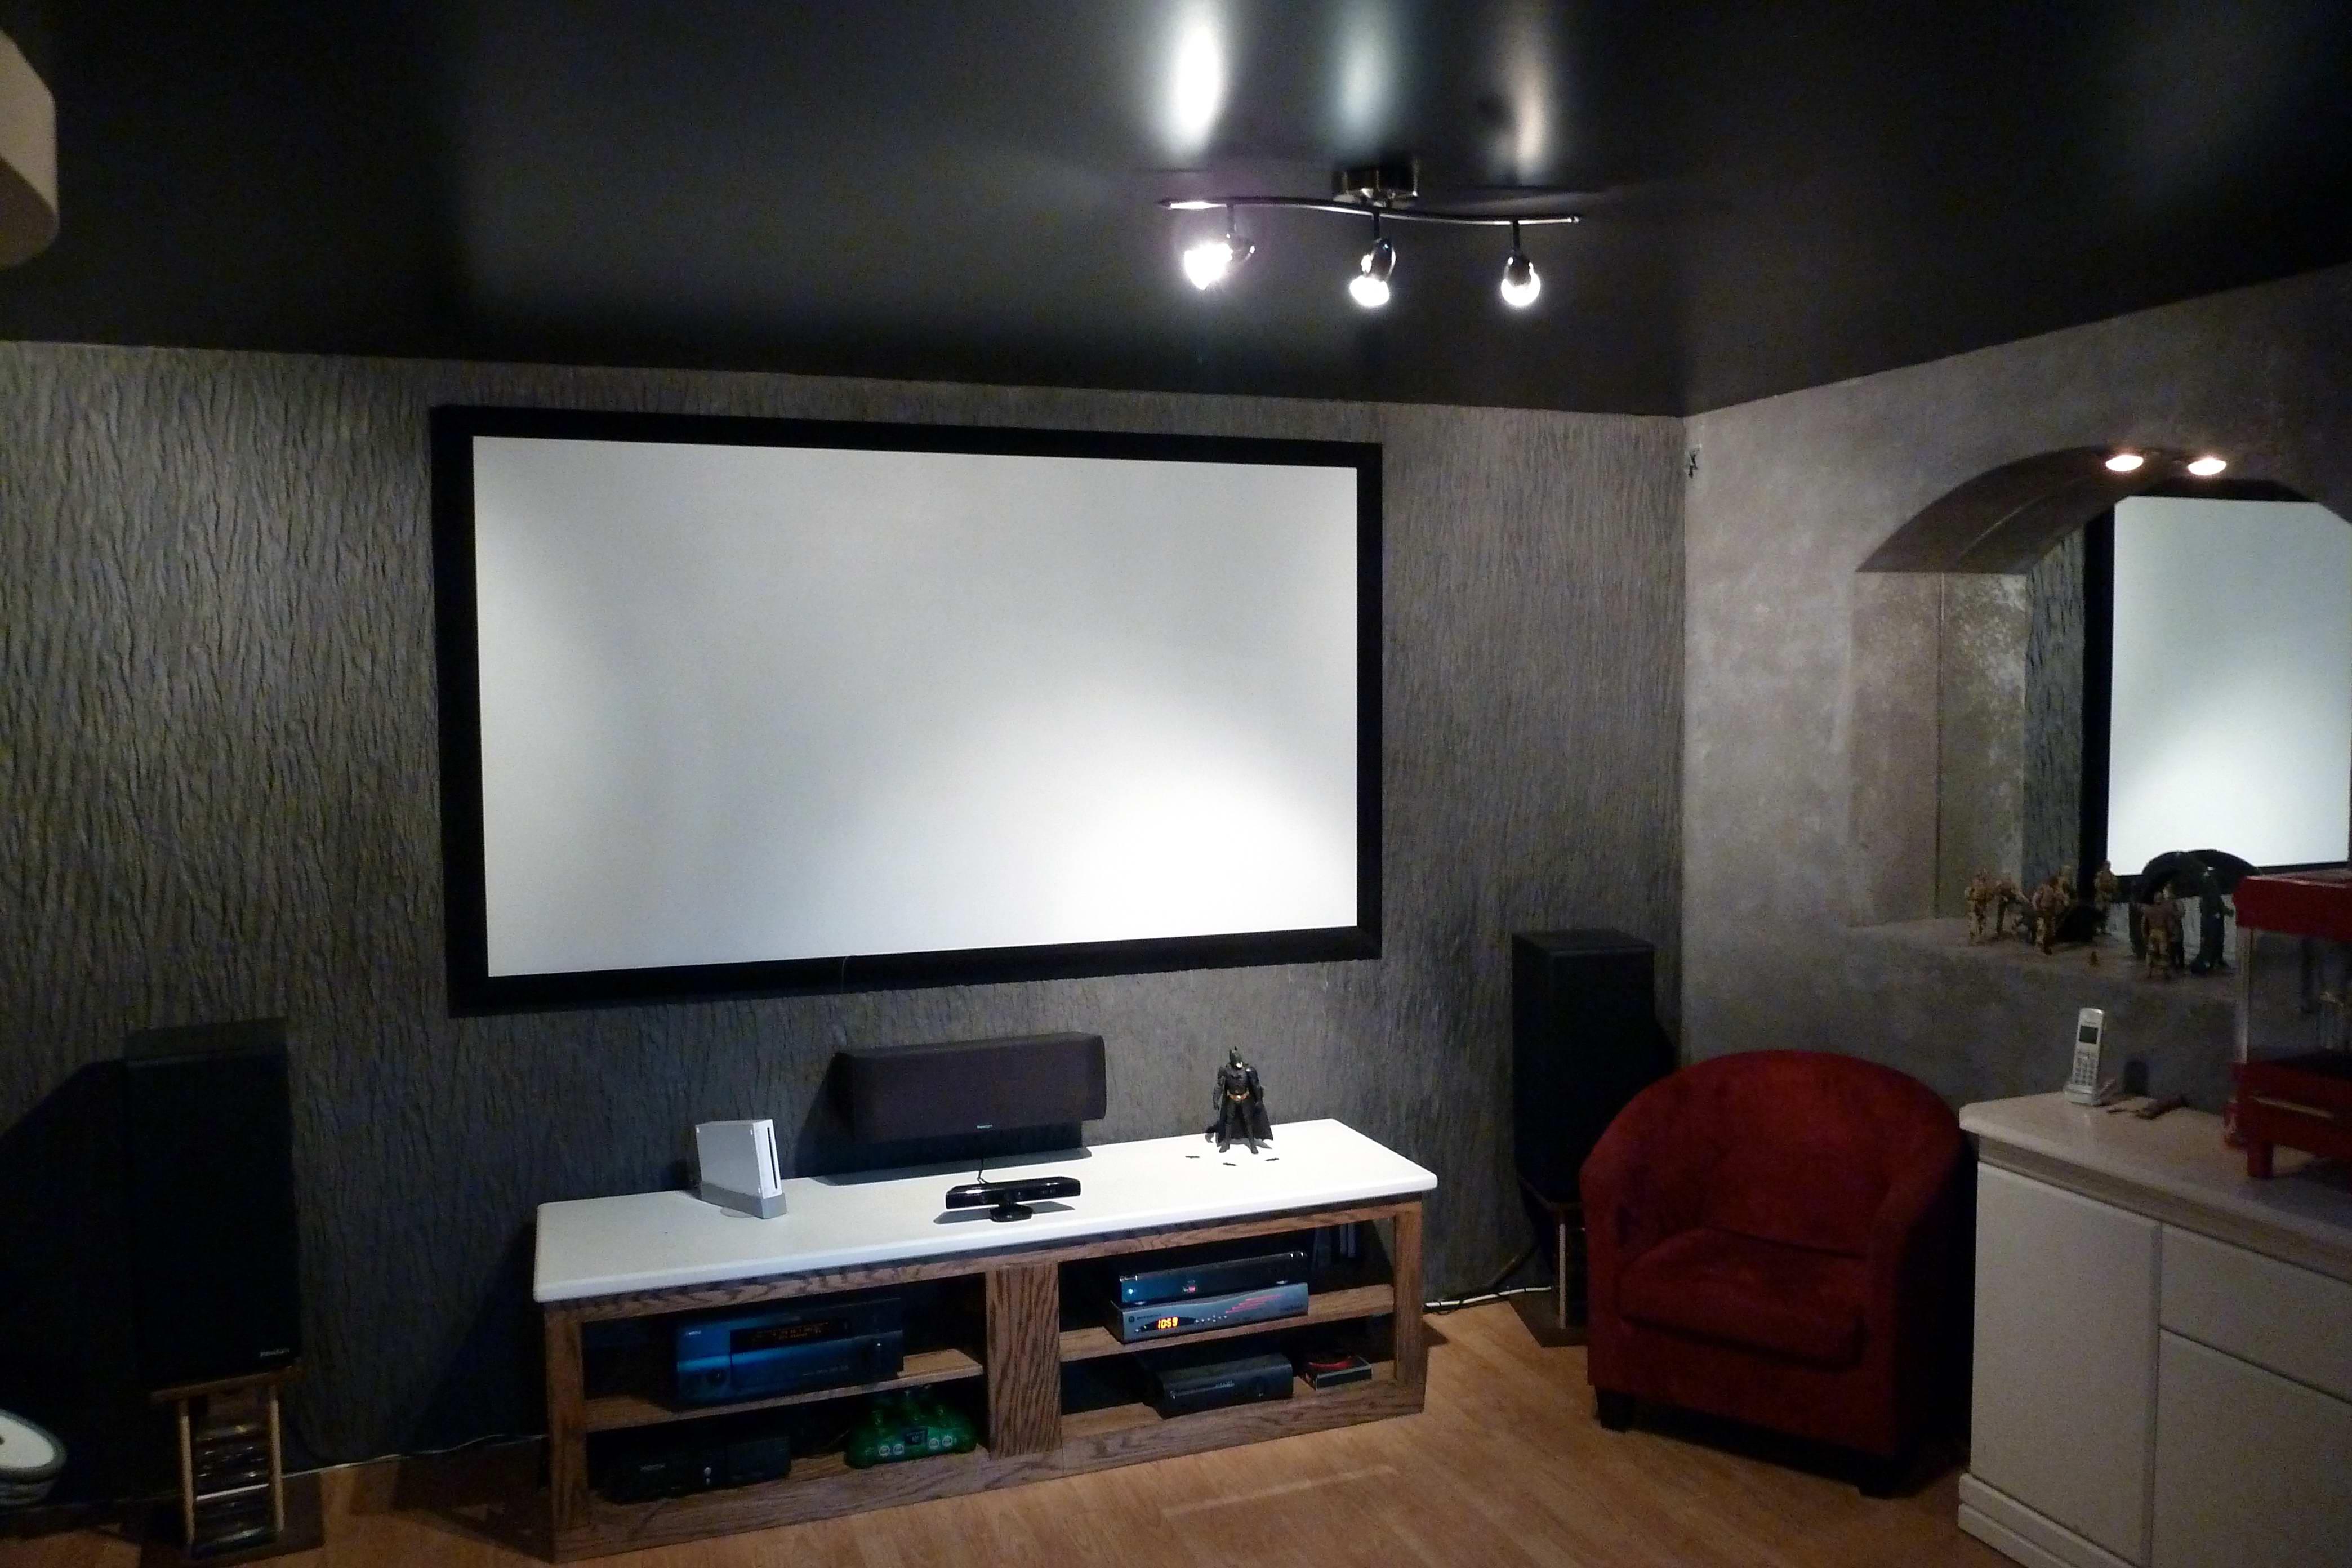 salle cinema maison fauteuil relax la salle de cinma soussol mexican star lights with salle. Black Bedroom Furniture Sets. Home Design Ideas